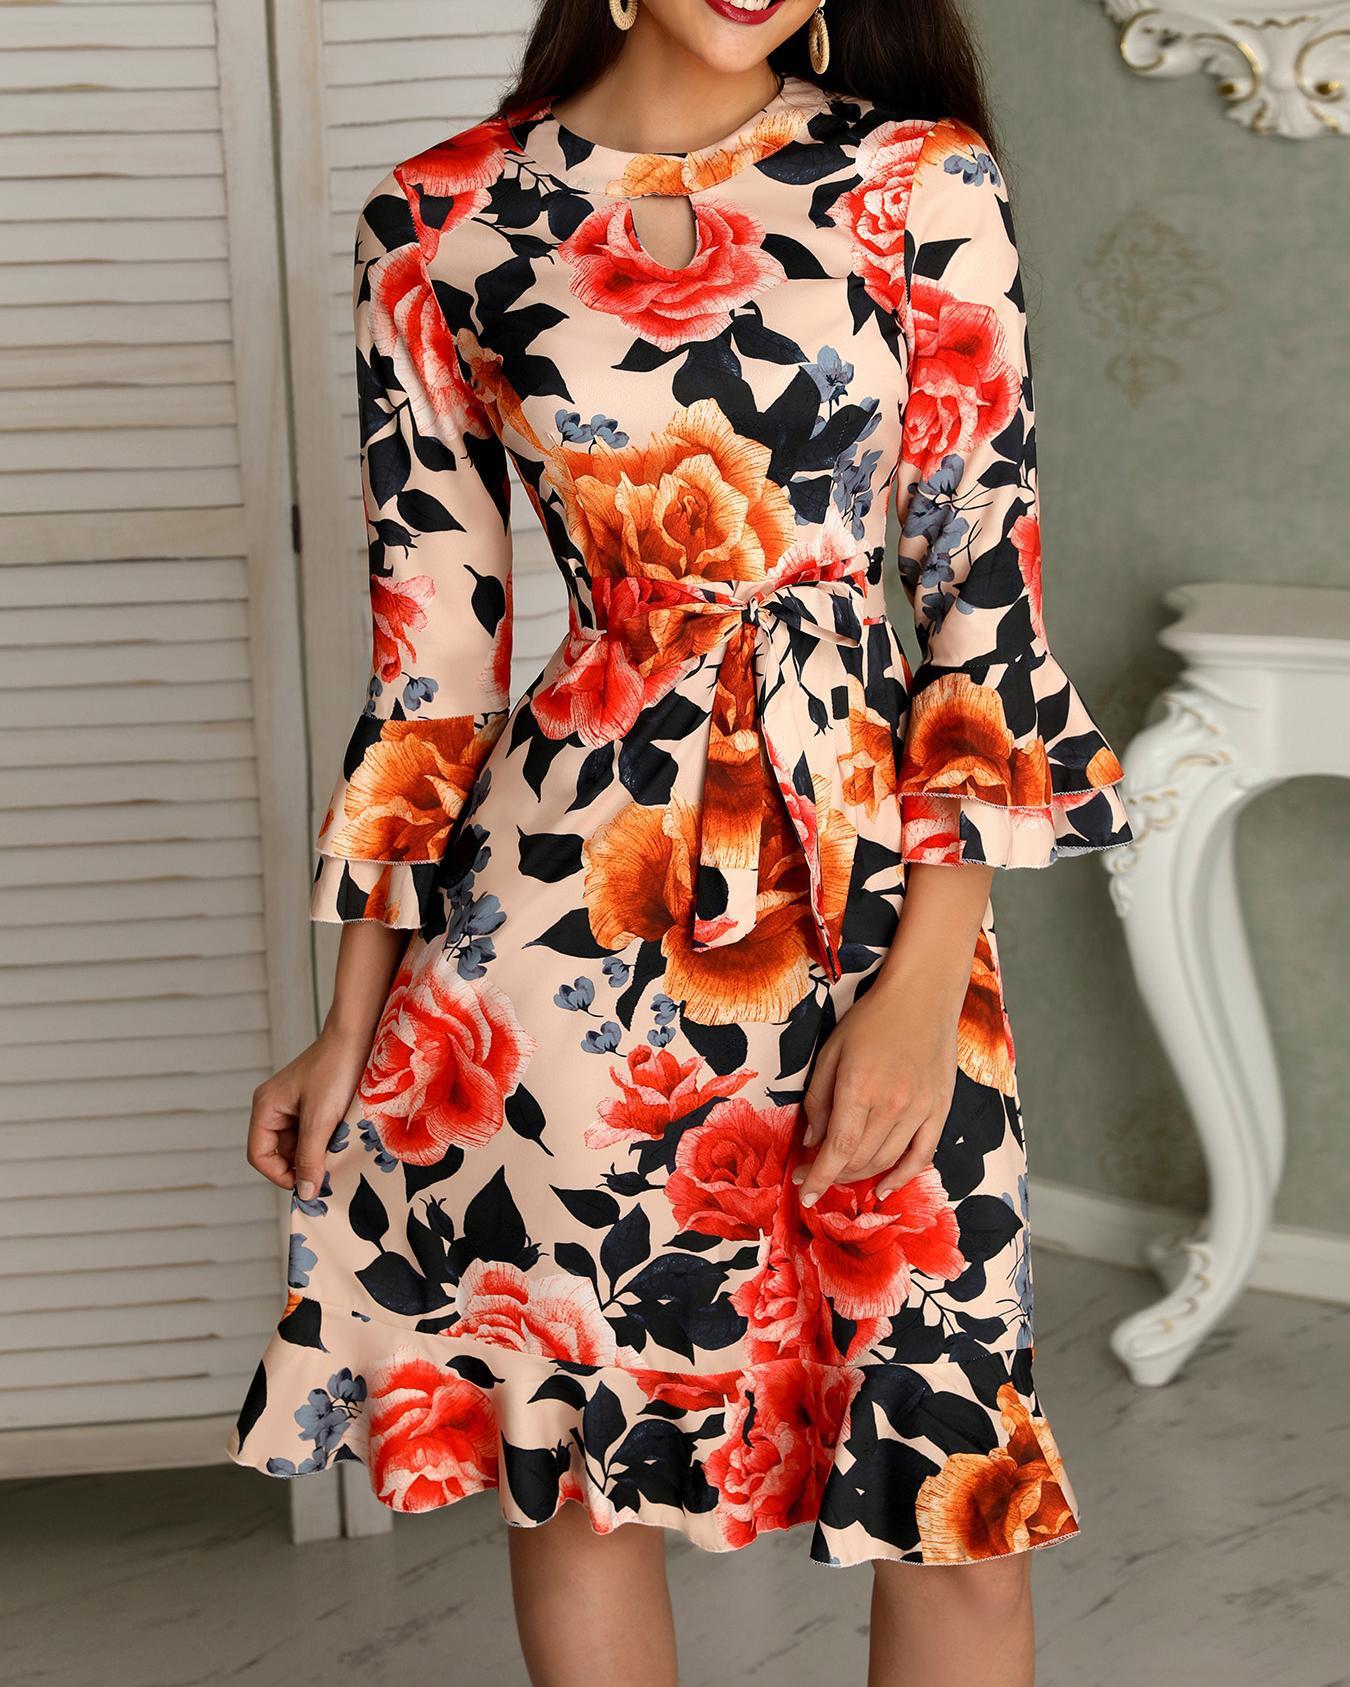 Floral Print Cutout Ruffles Flared Sleeve Casual Dress фото